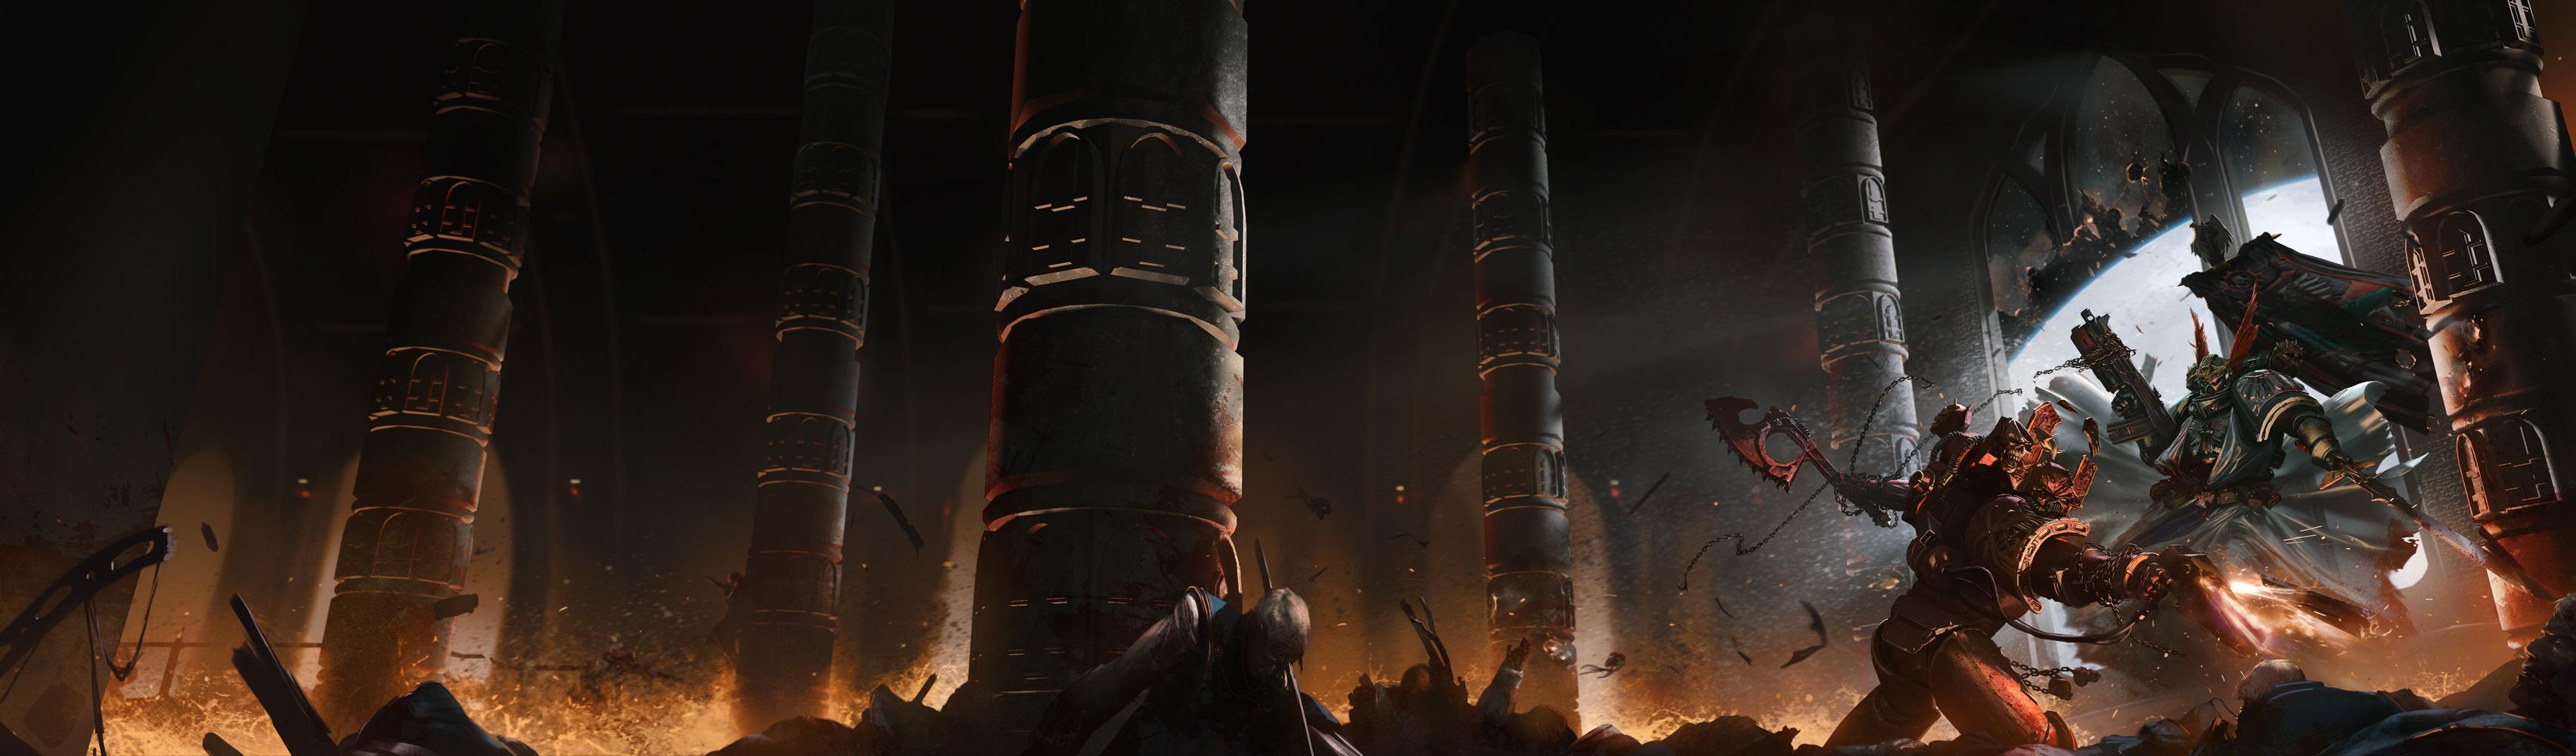 Warhammer 40k death company wallpaper - Black Library Trials Of Azrael By Ukitakumuki